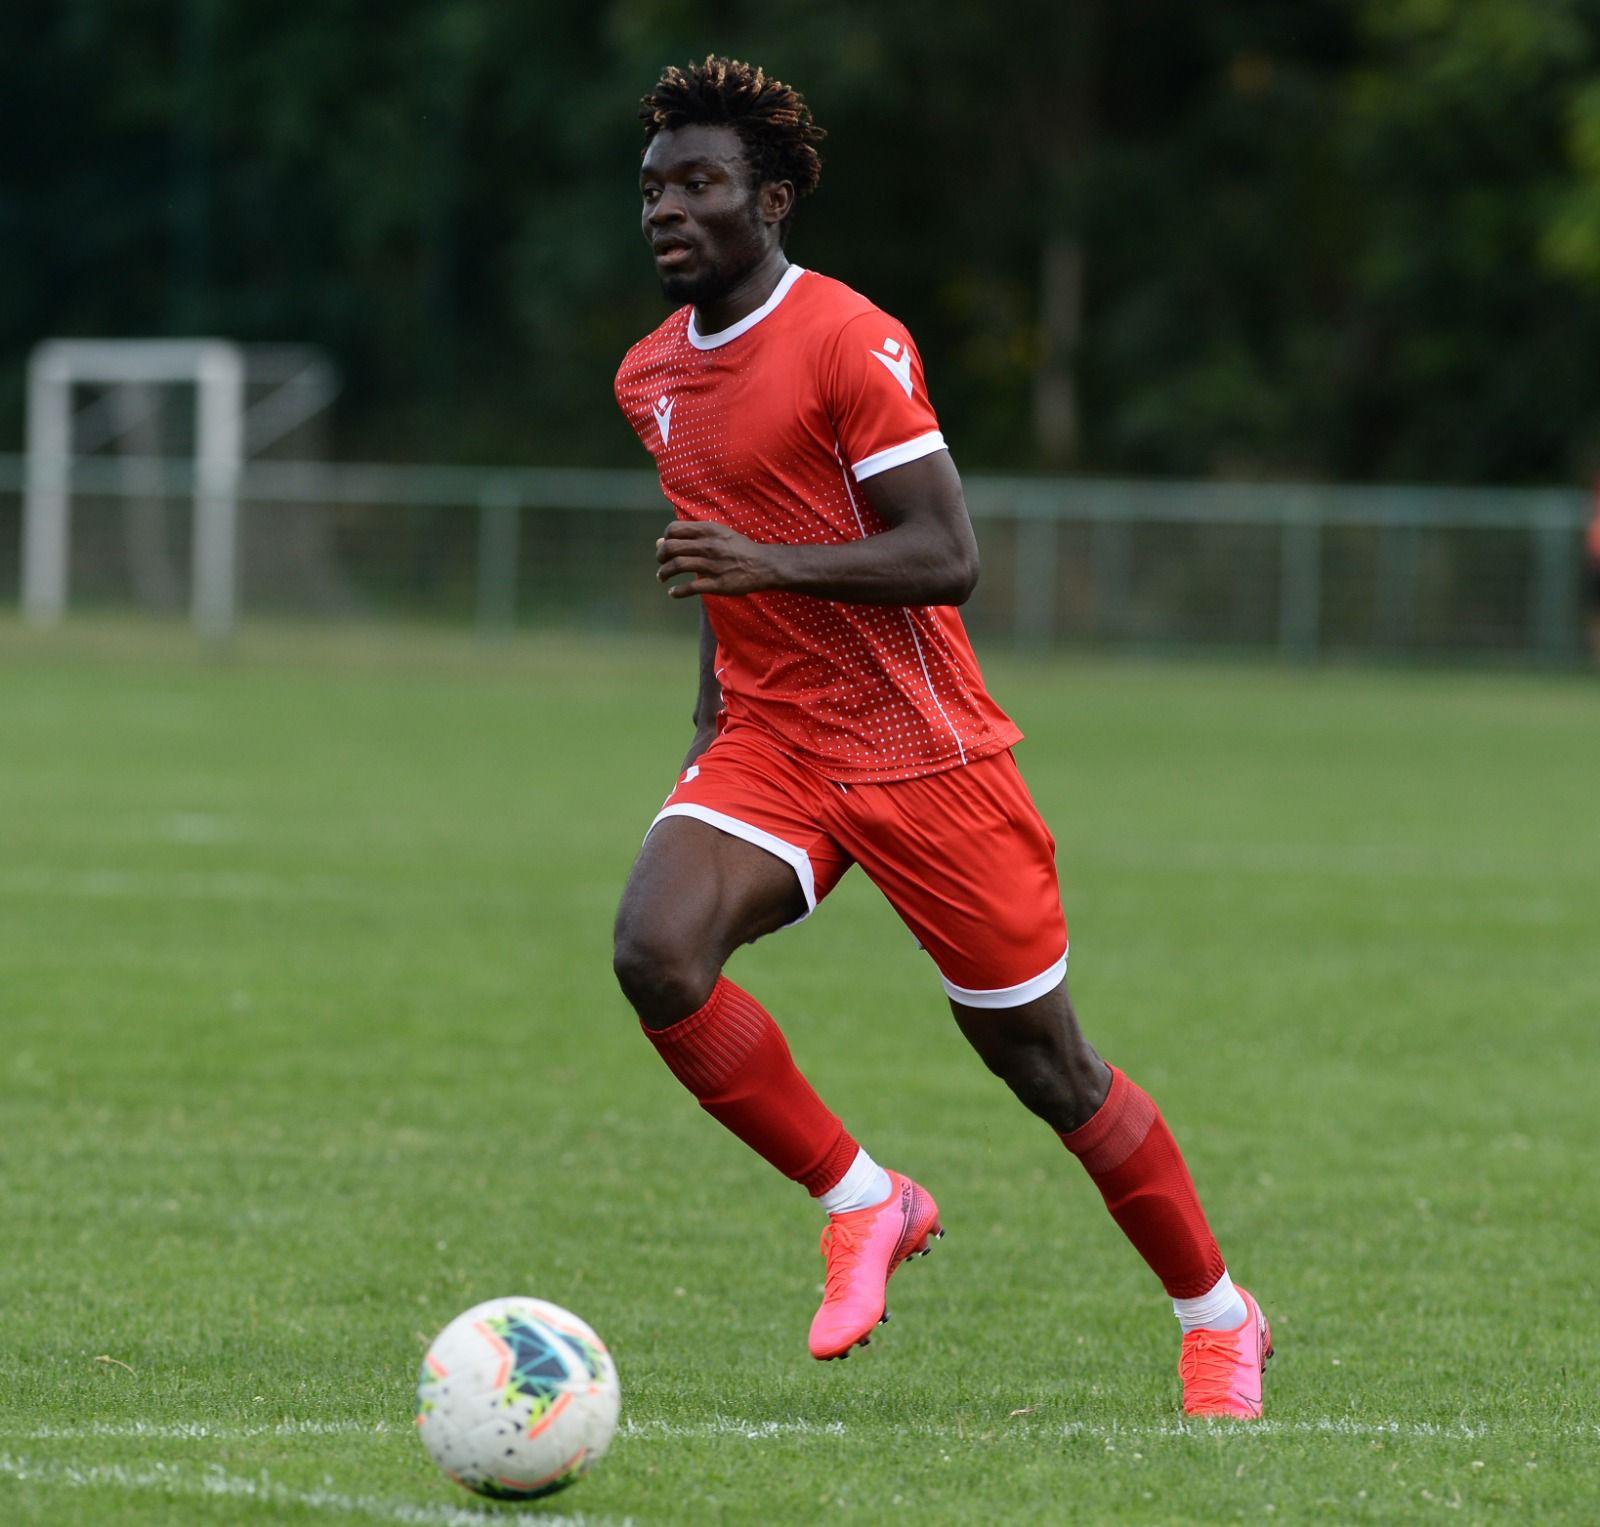 Ghanaian forward Ibrahim Mustapha confident his glittering form will earn him return to Red Star Belgrade